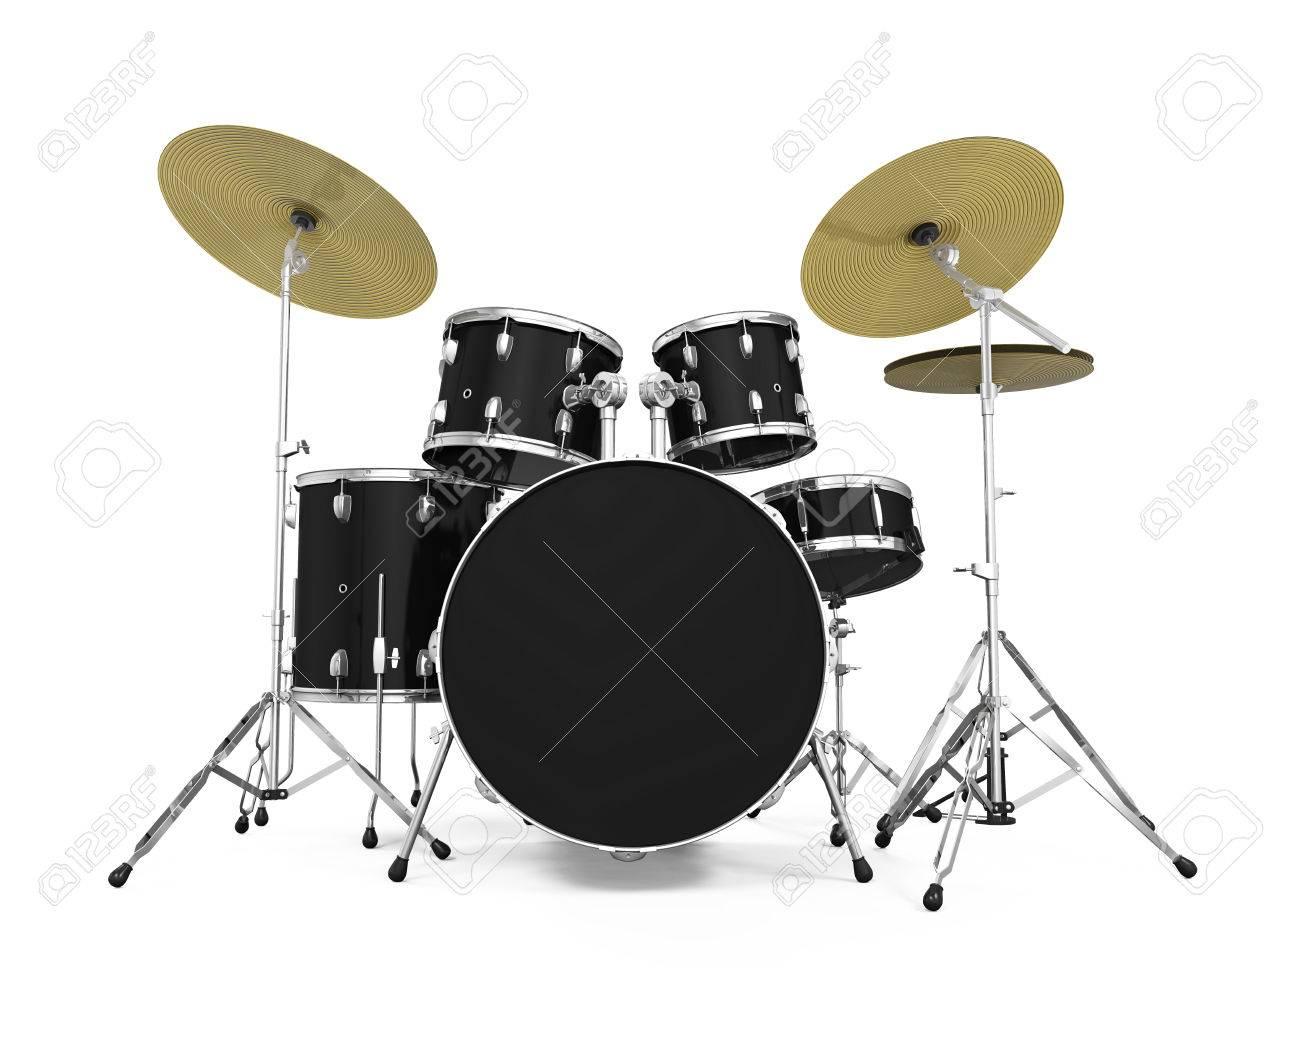 Drum Kit Isolated - 50673356